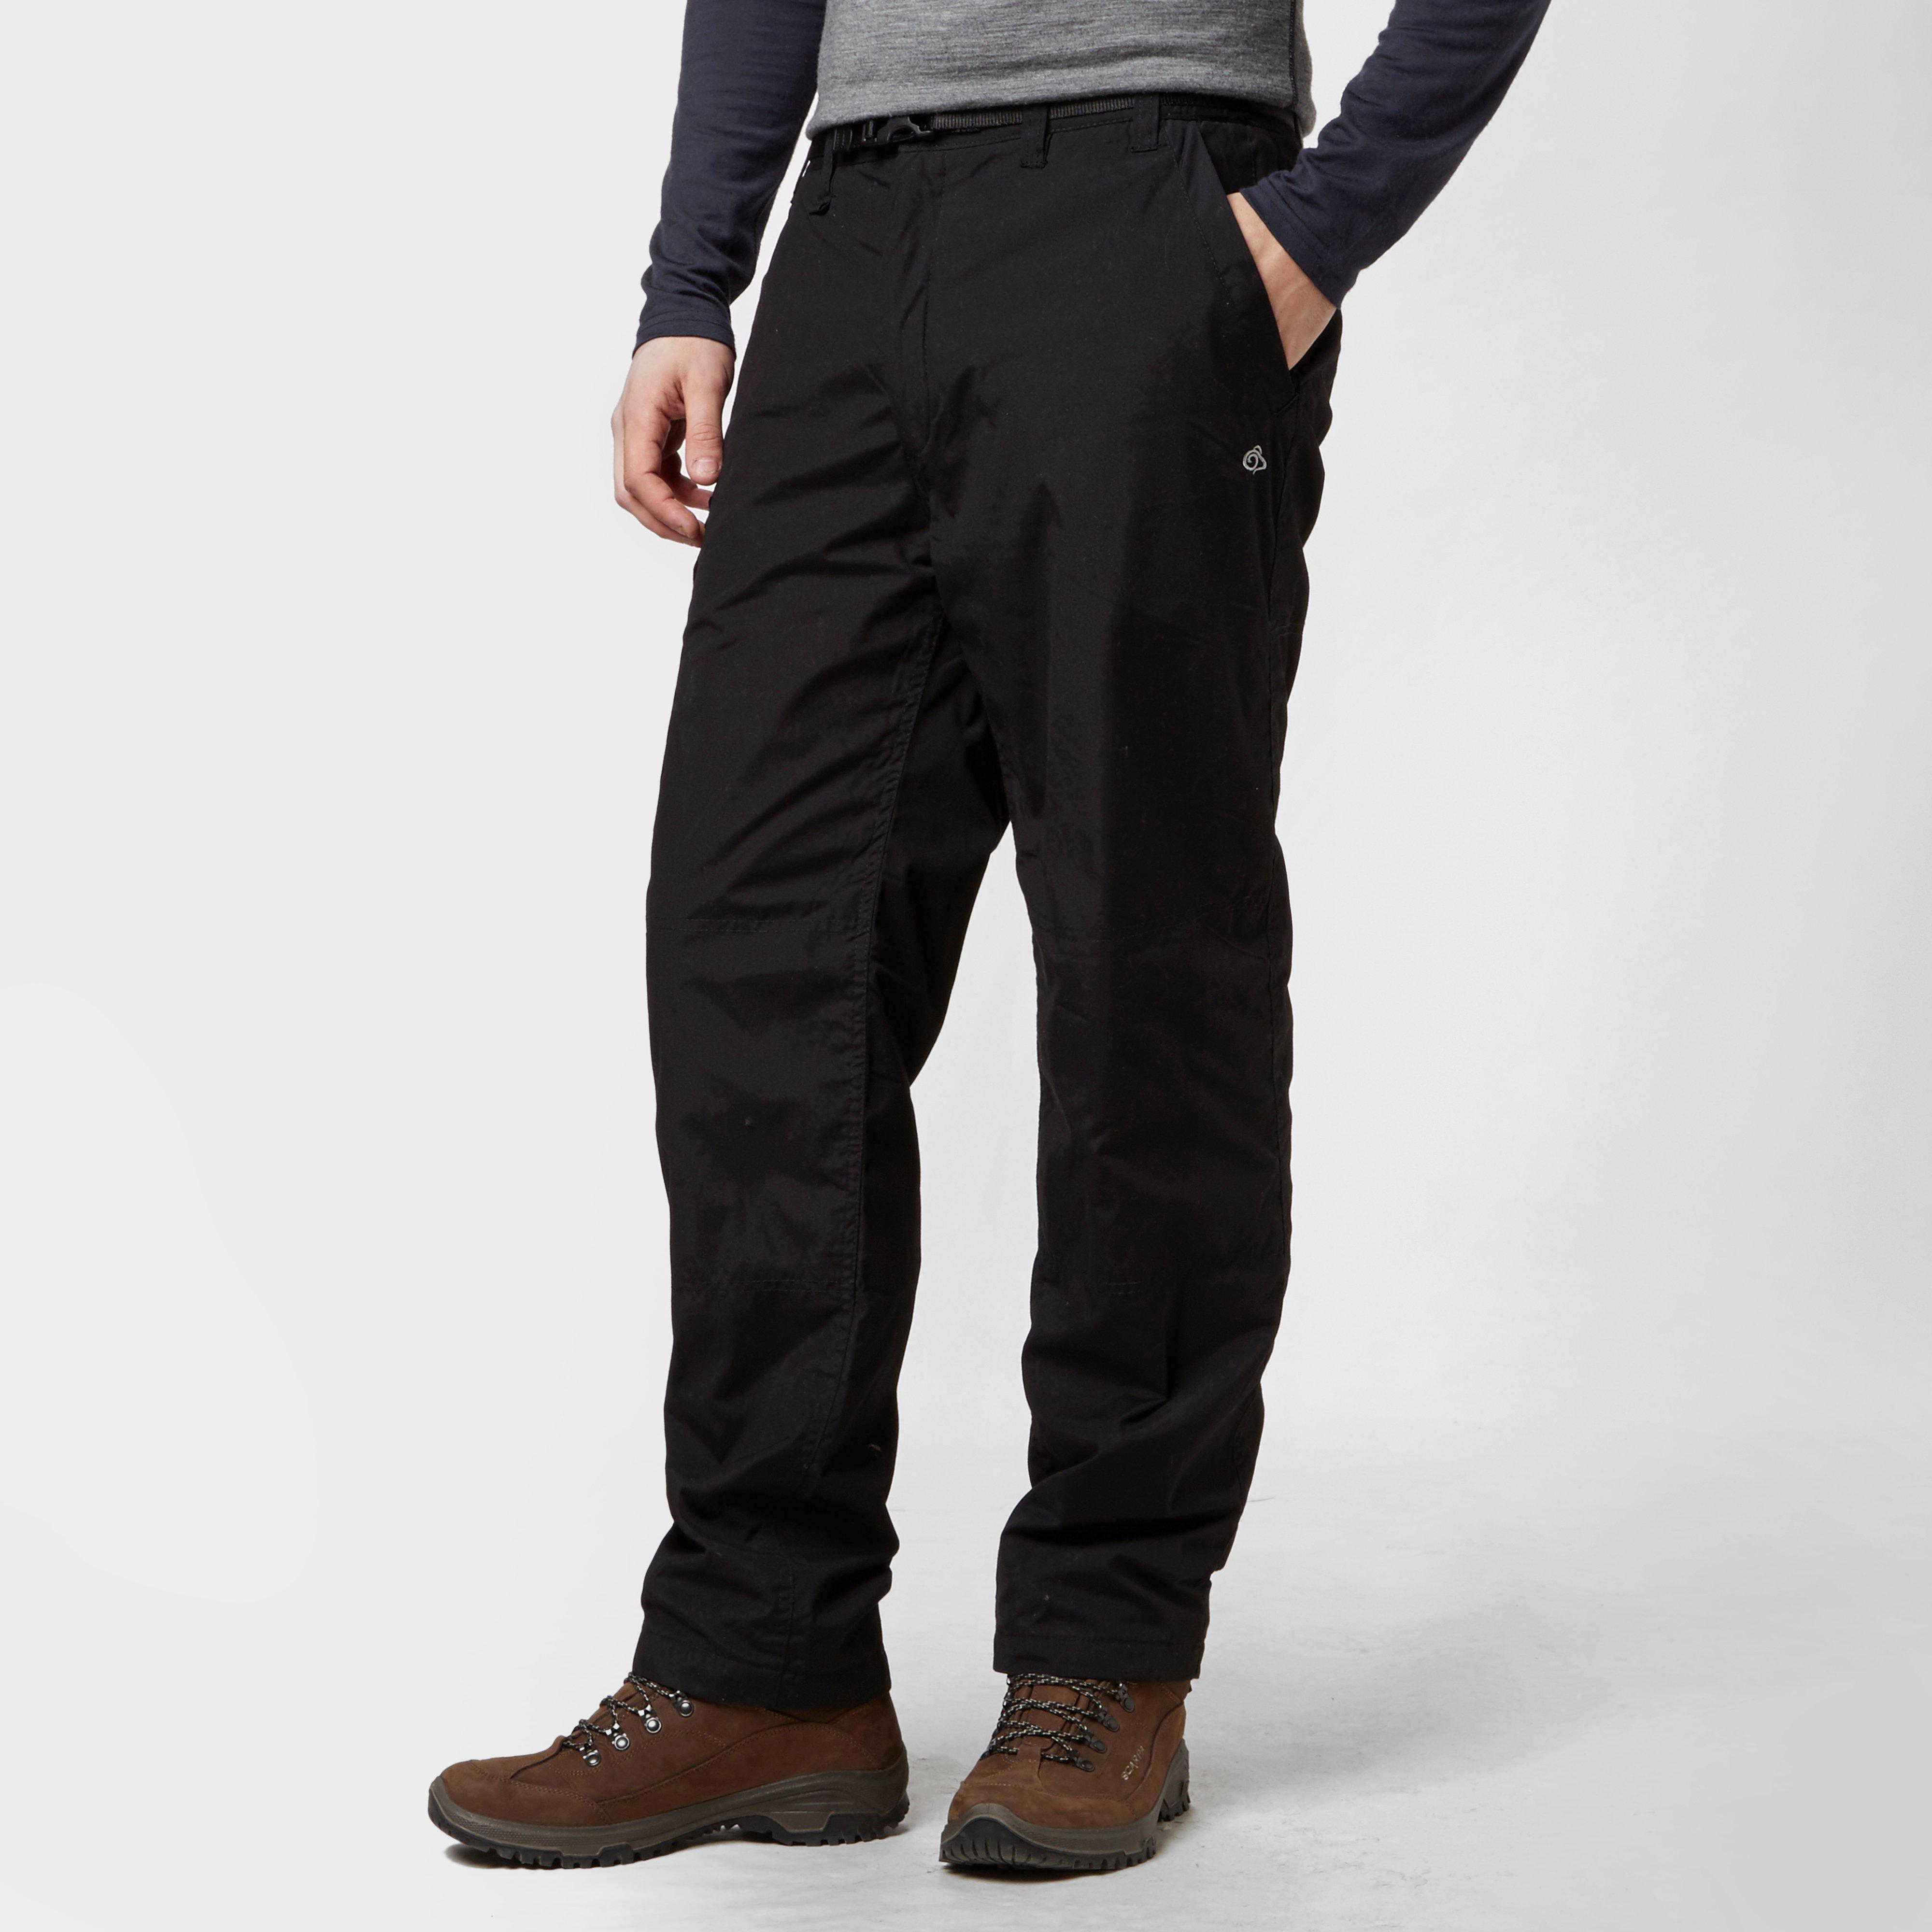 Craghoppers Craghoppers Mens Kiwi Lined Trousers - Black, Black